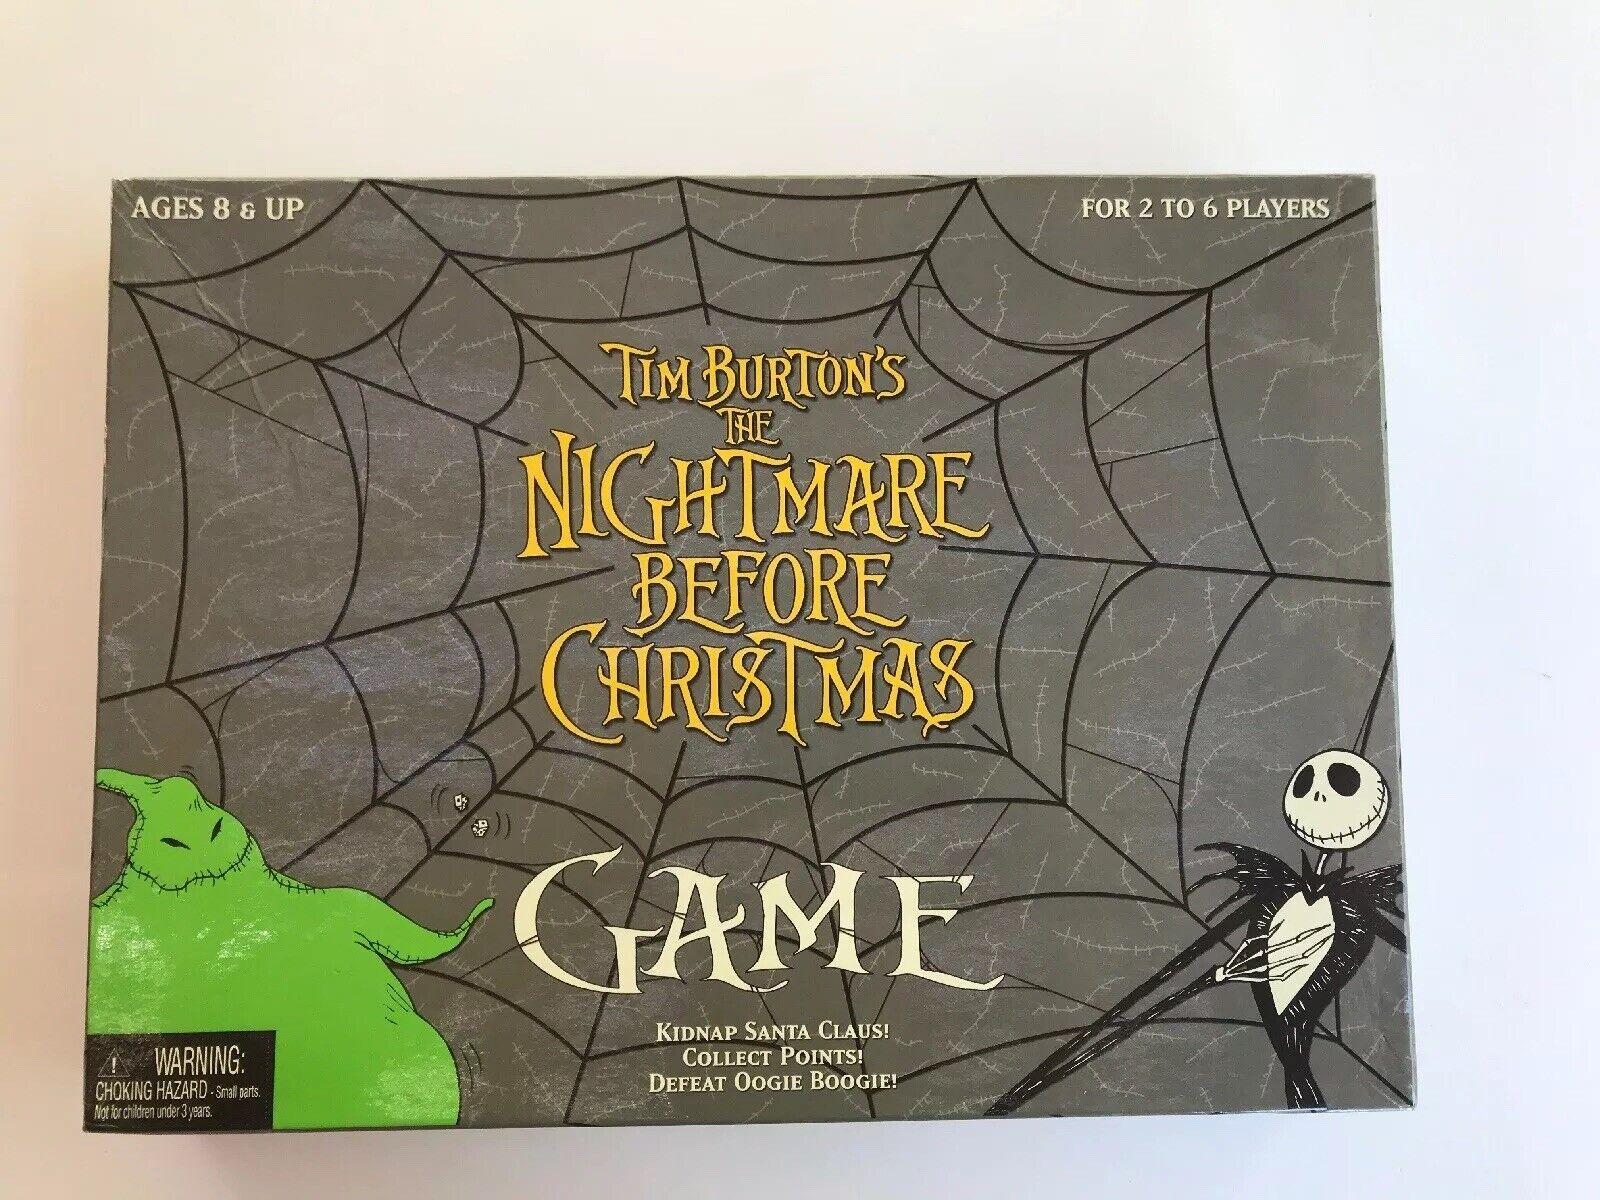 Tim Burton's The Nightmare Before Christmas Board Game by Neca